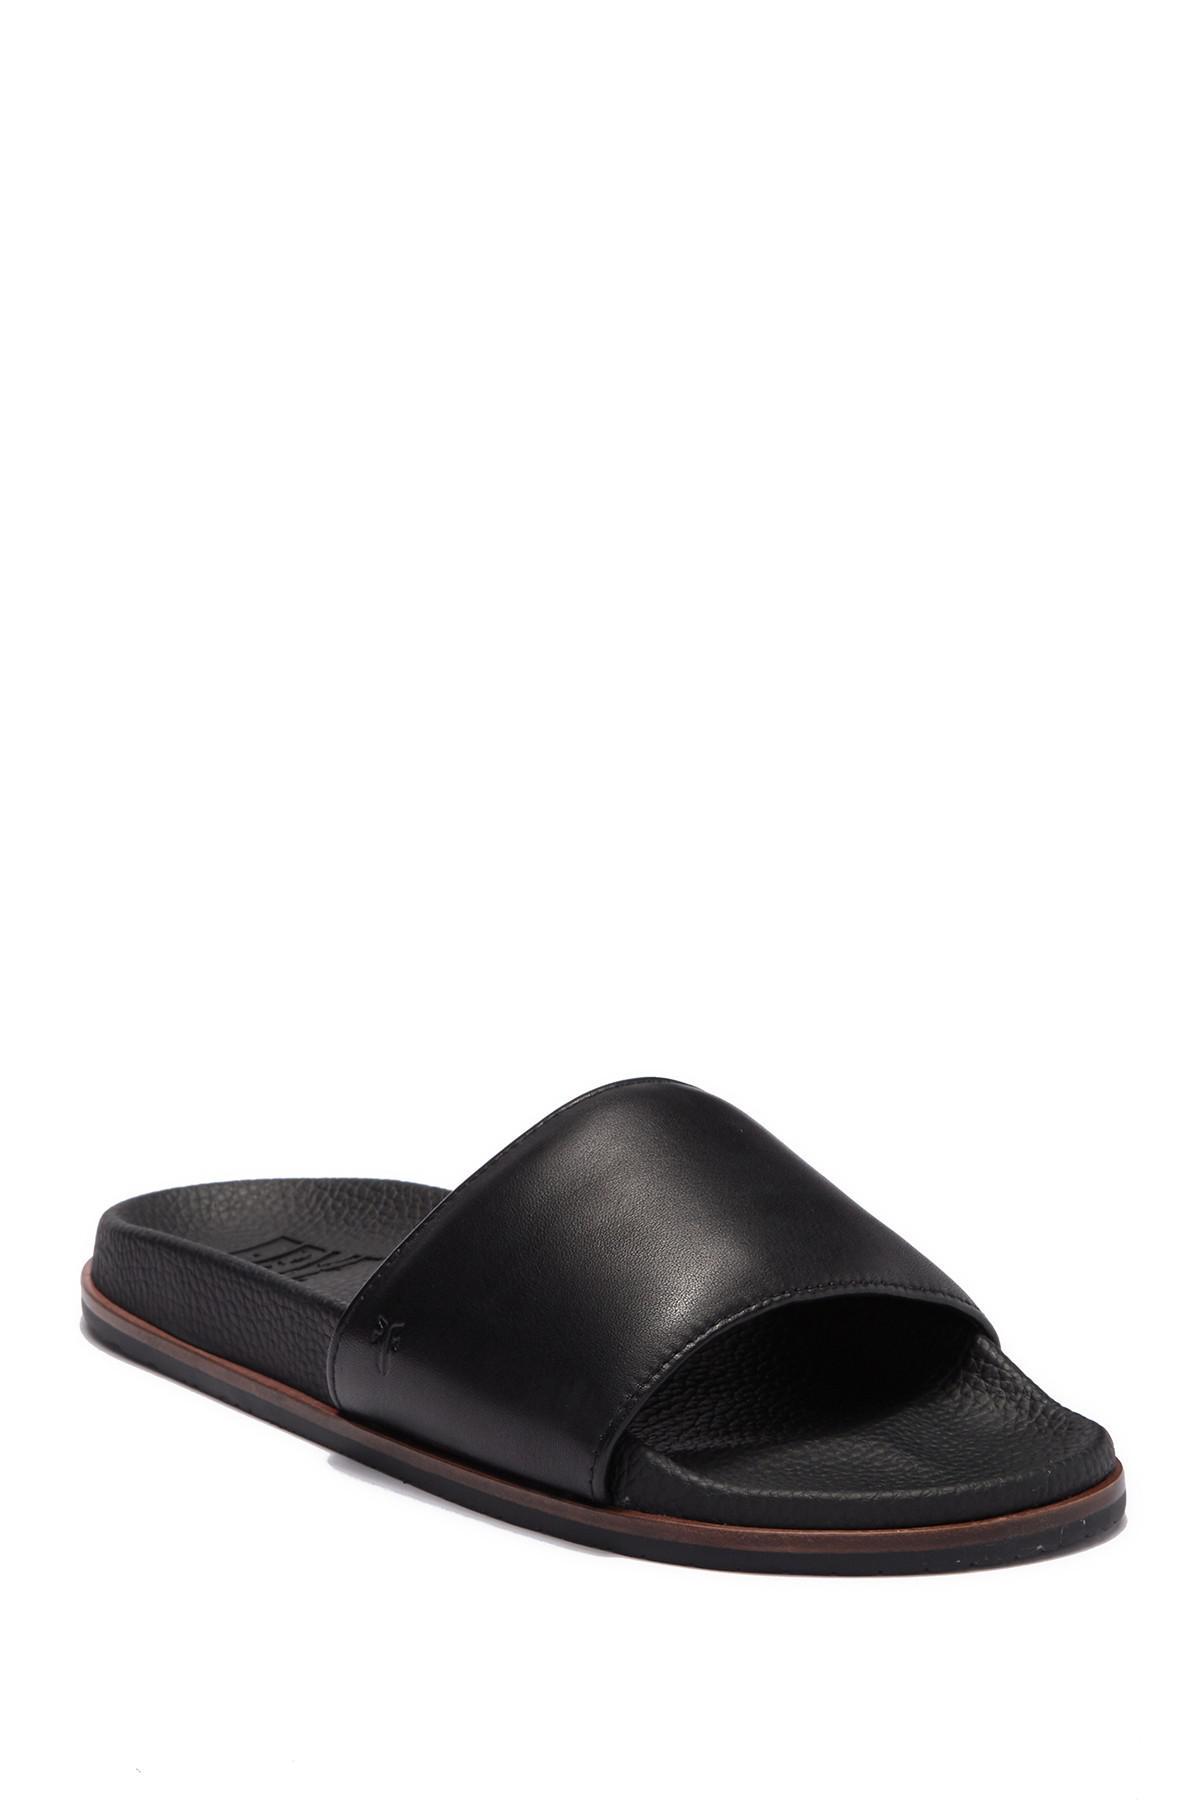 e2961ab3148 Lyst - Frye Emerson Slide Sandal in Black for Men - Save 76%